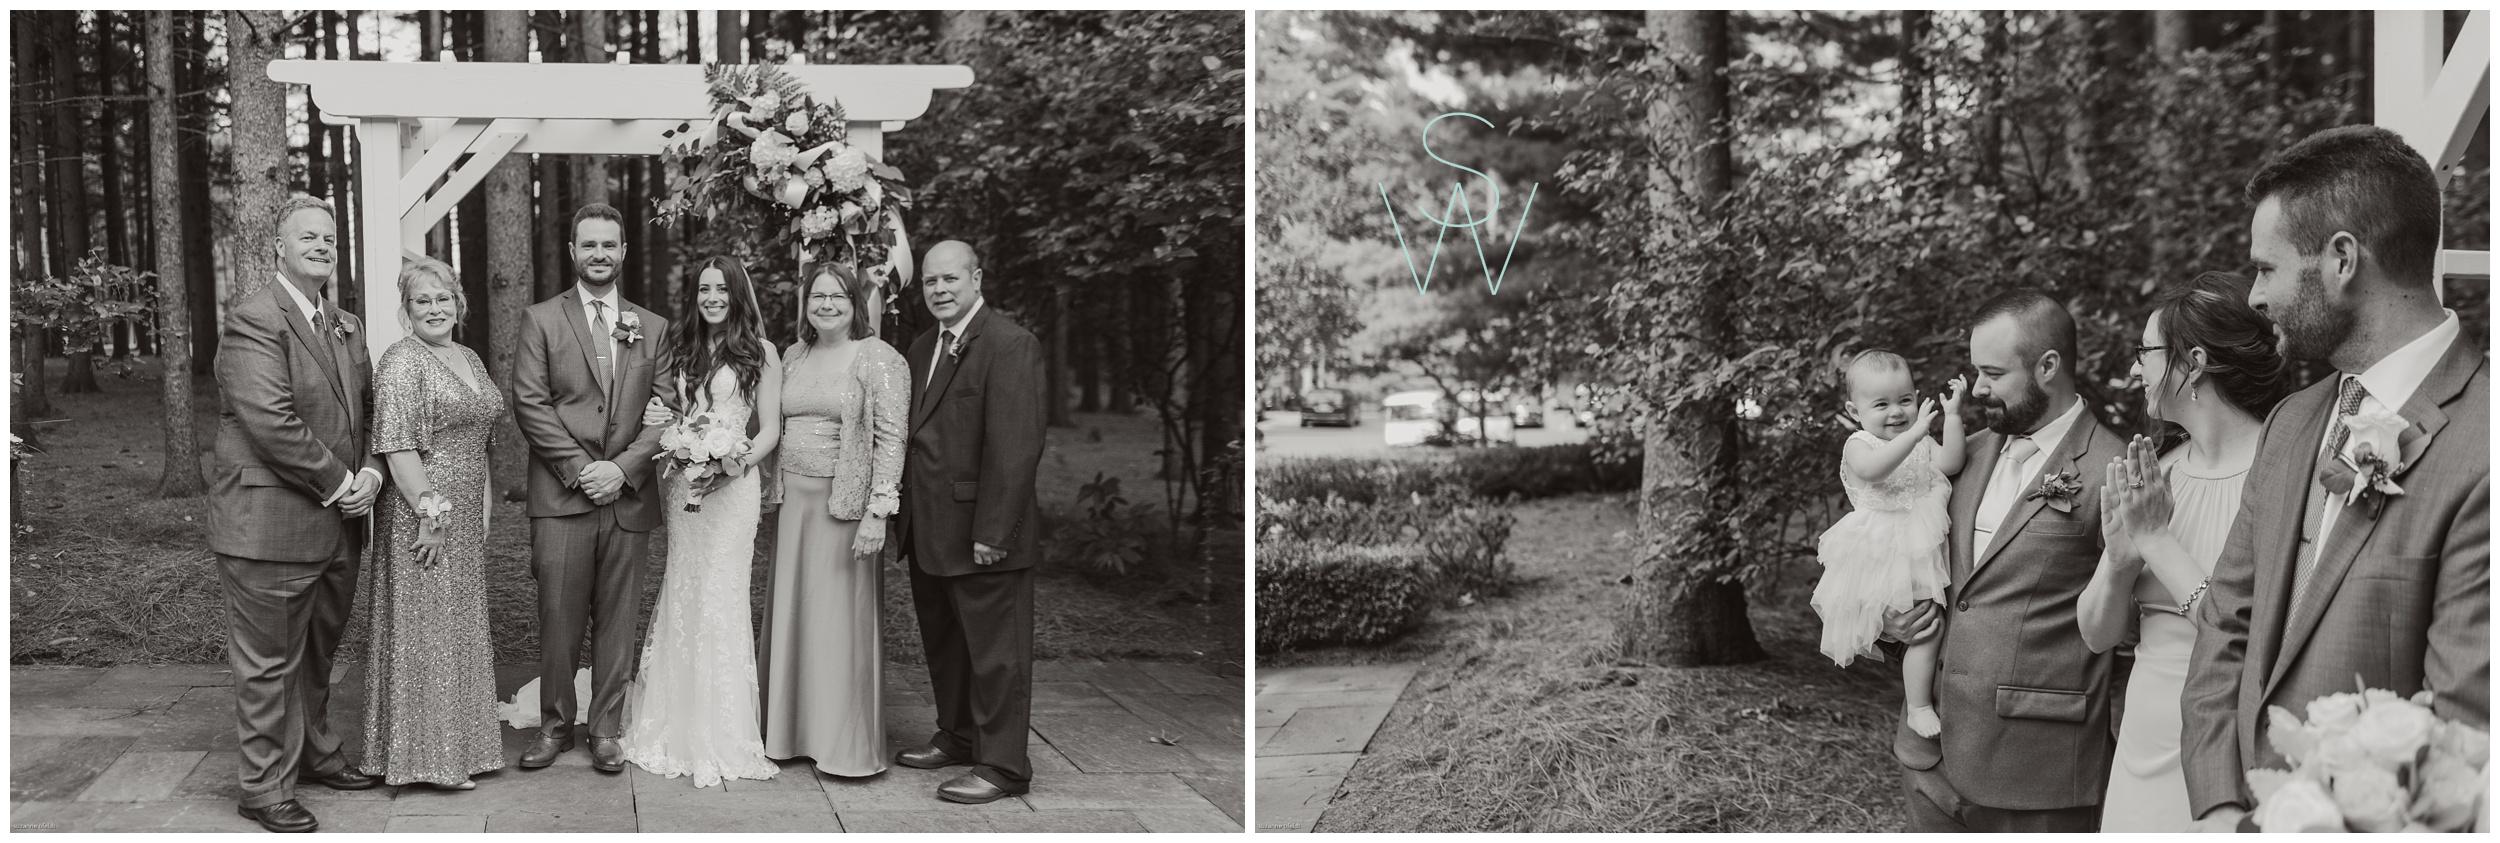 san.diego.wedding.photography_0162.jpg